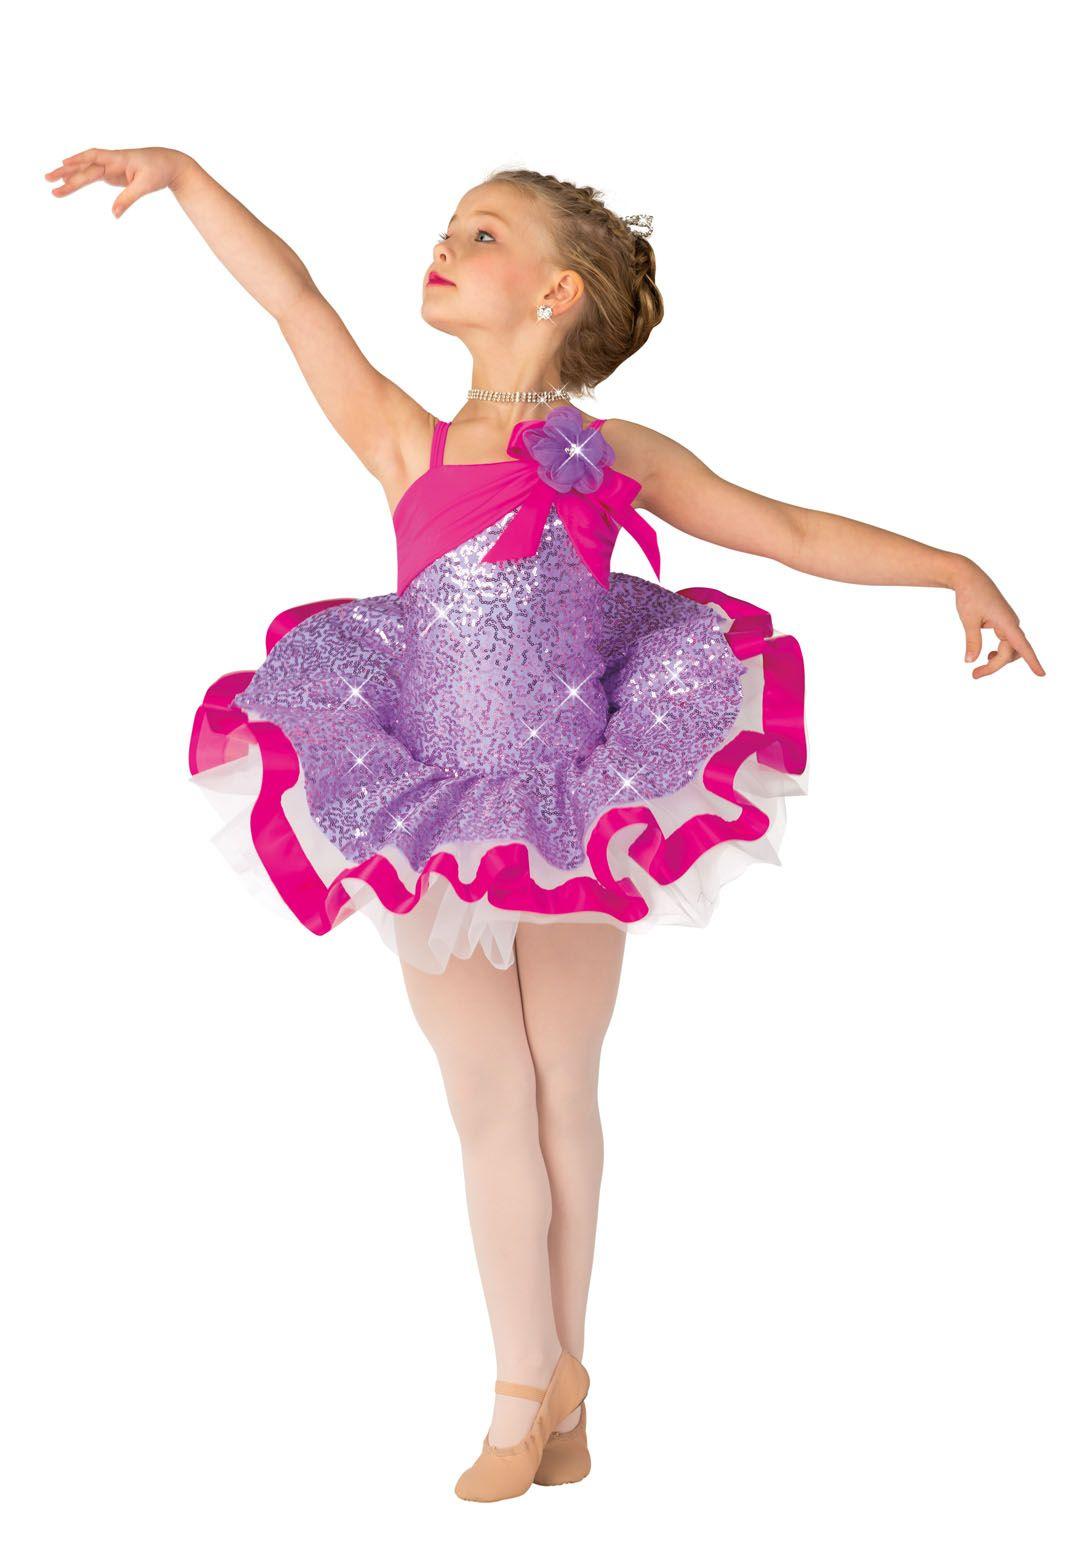 bfd02e024632 Hover to Enlarge Darling Dancer Image